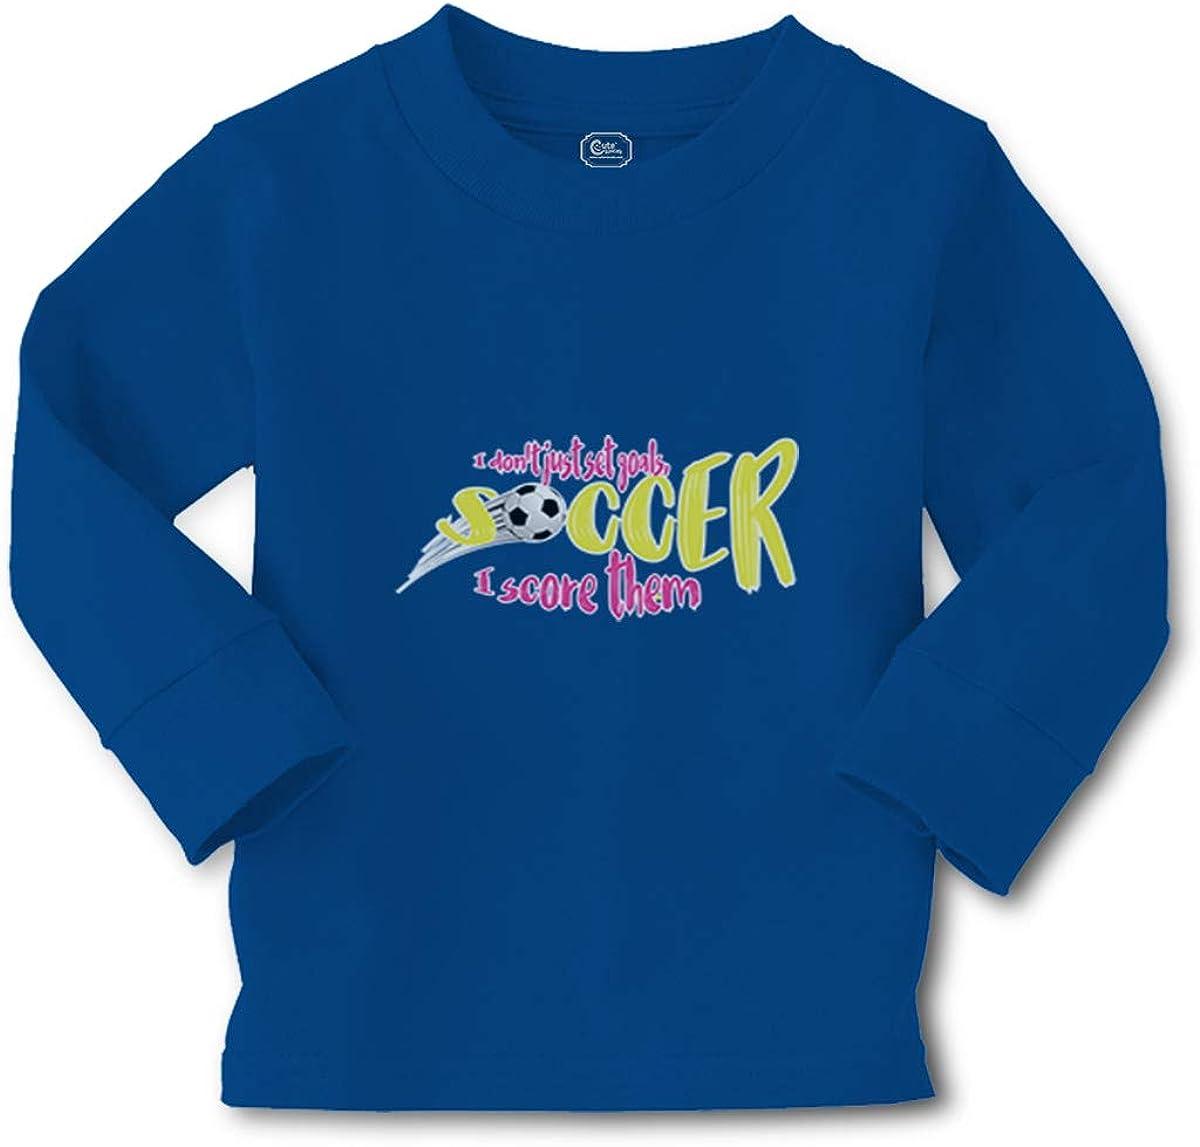 Kids Long Sleeve T Shirt I Don't Just Set Goals -Soccer- Score Them Cotton